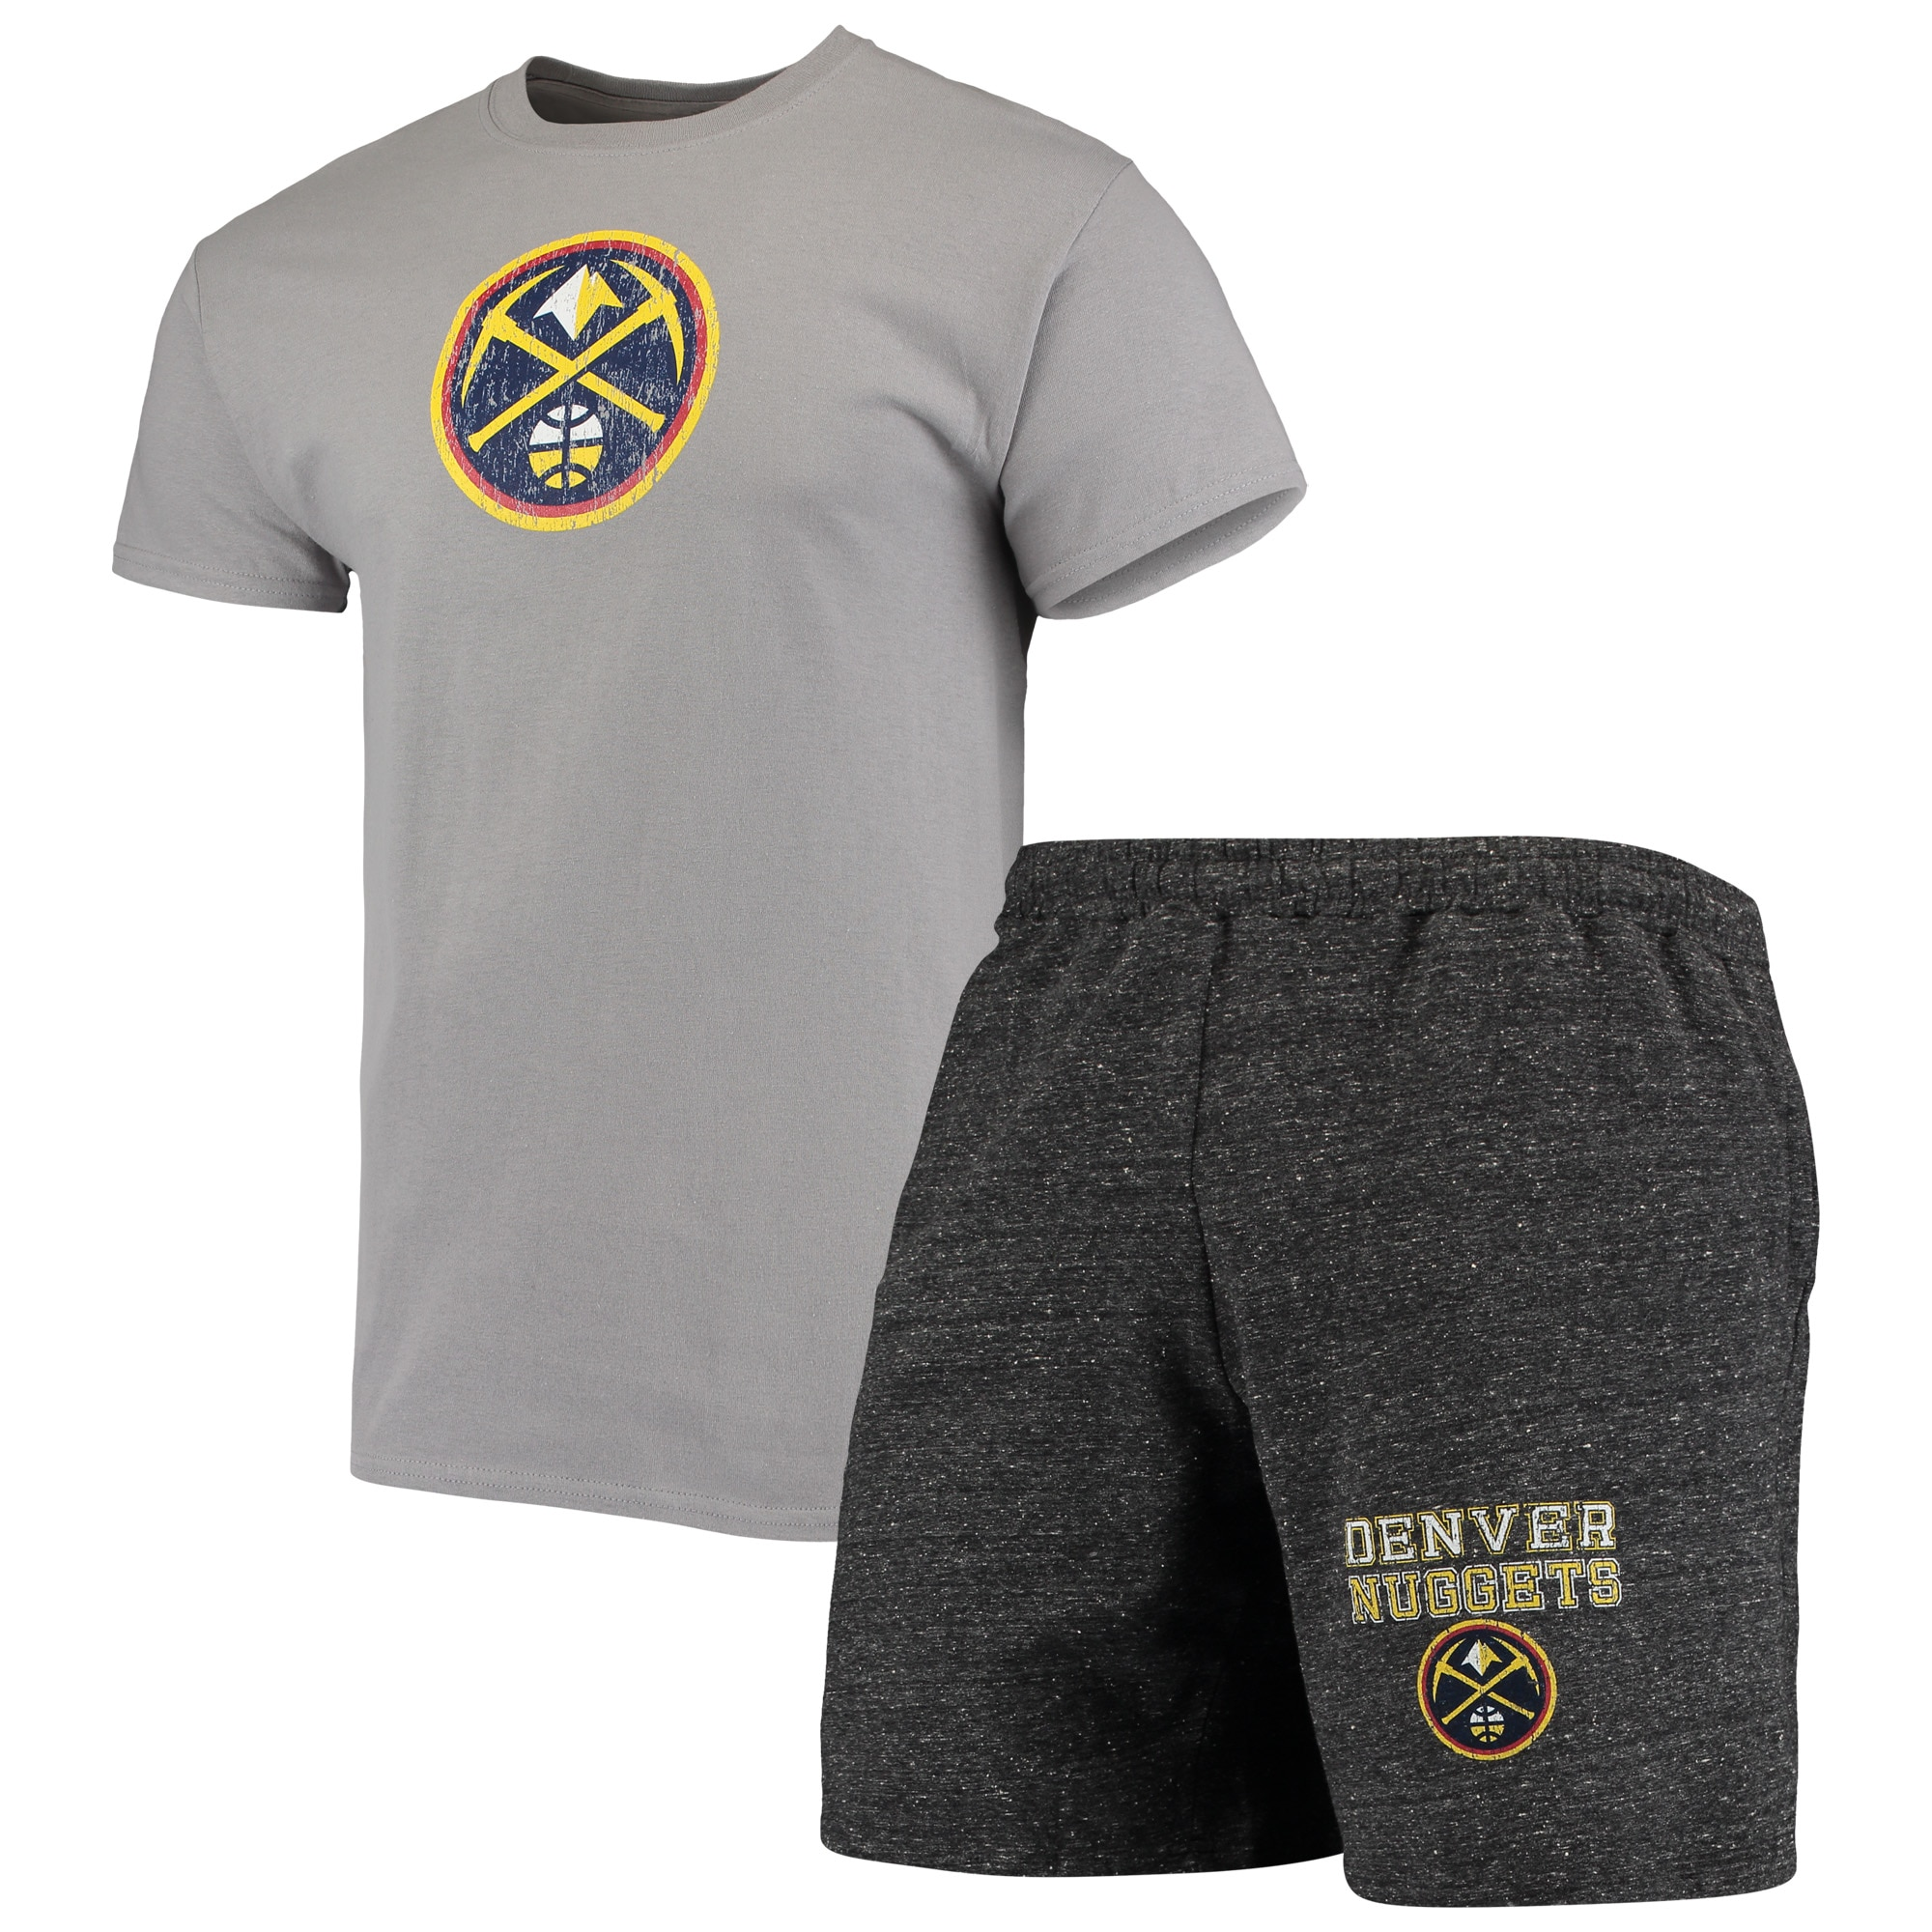 Denver Nuggets Concepts Sport Pitch T-Shirt & Shorts Set - Gray/Charcoal